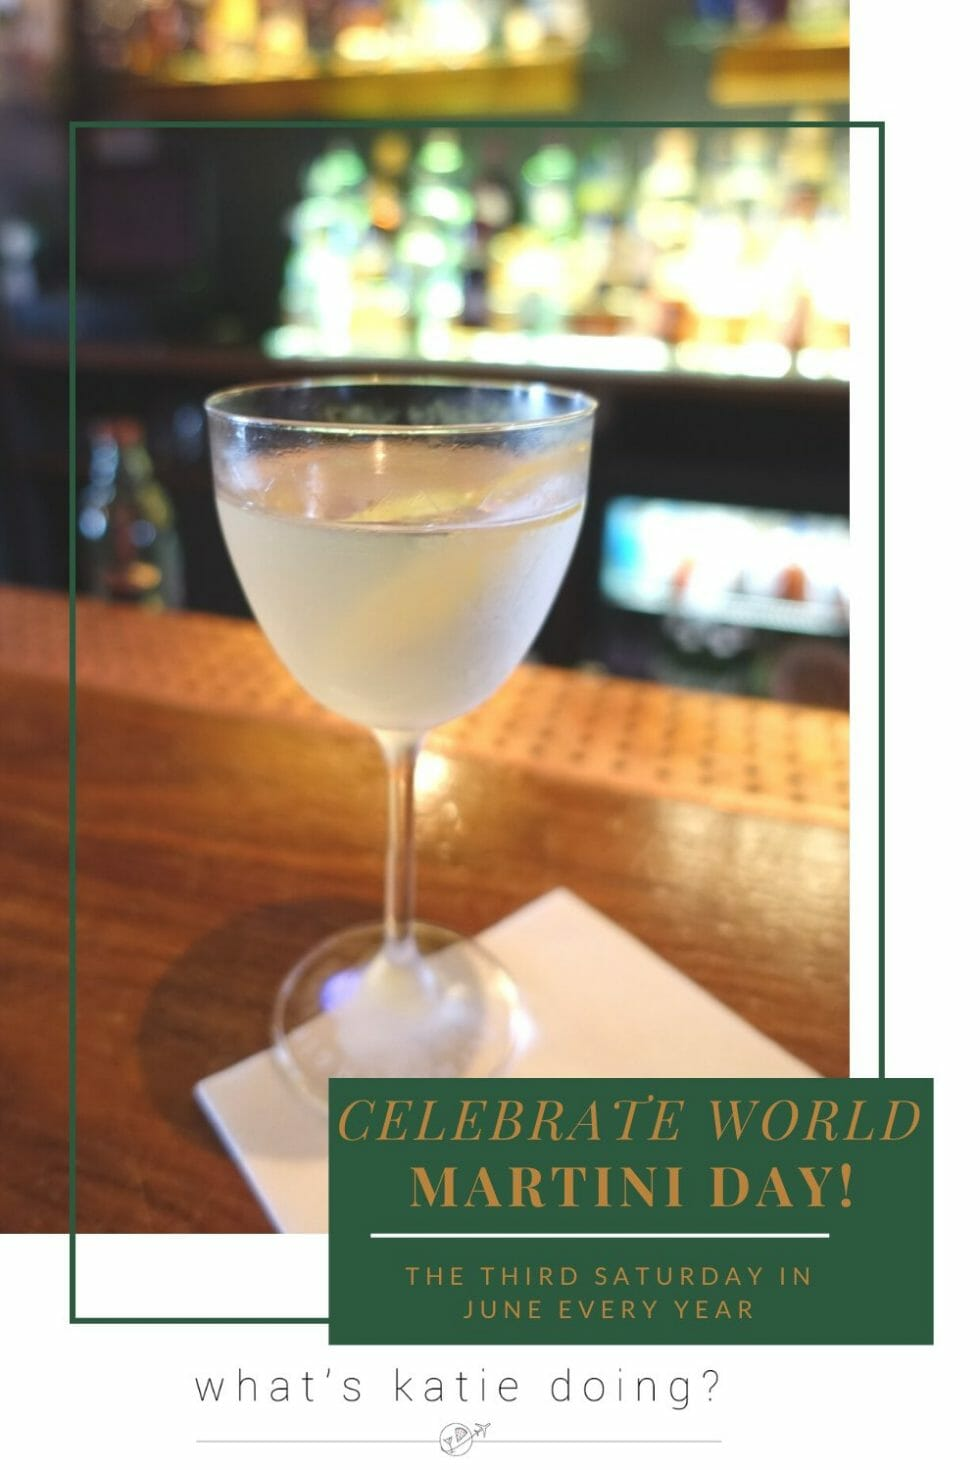 Celebrate World Martini Day - martini on a bar